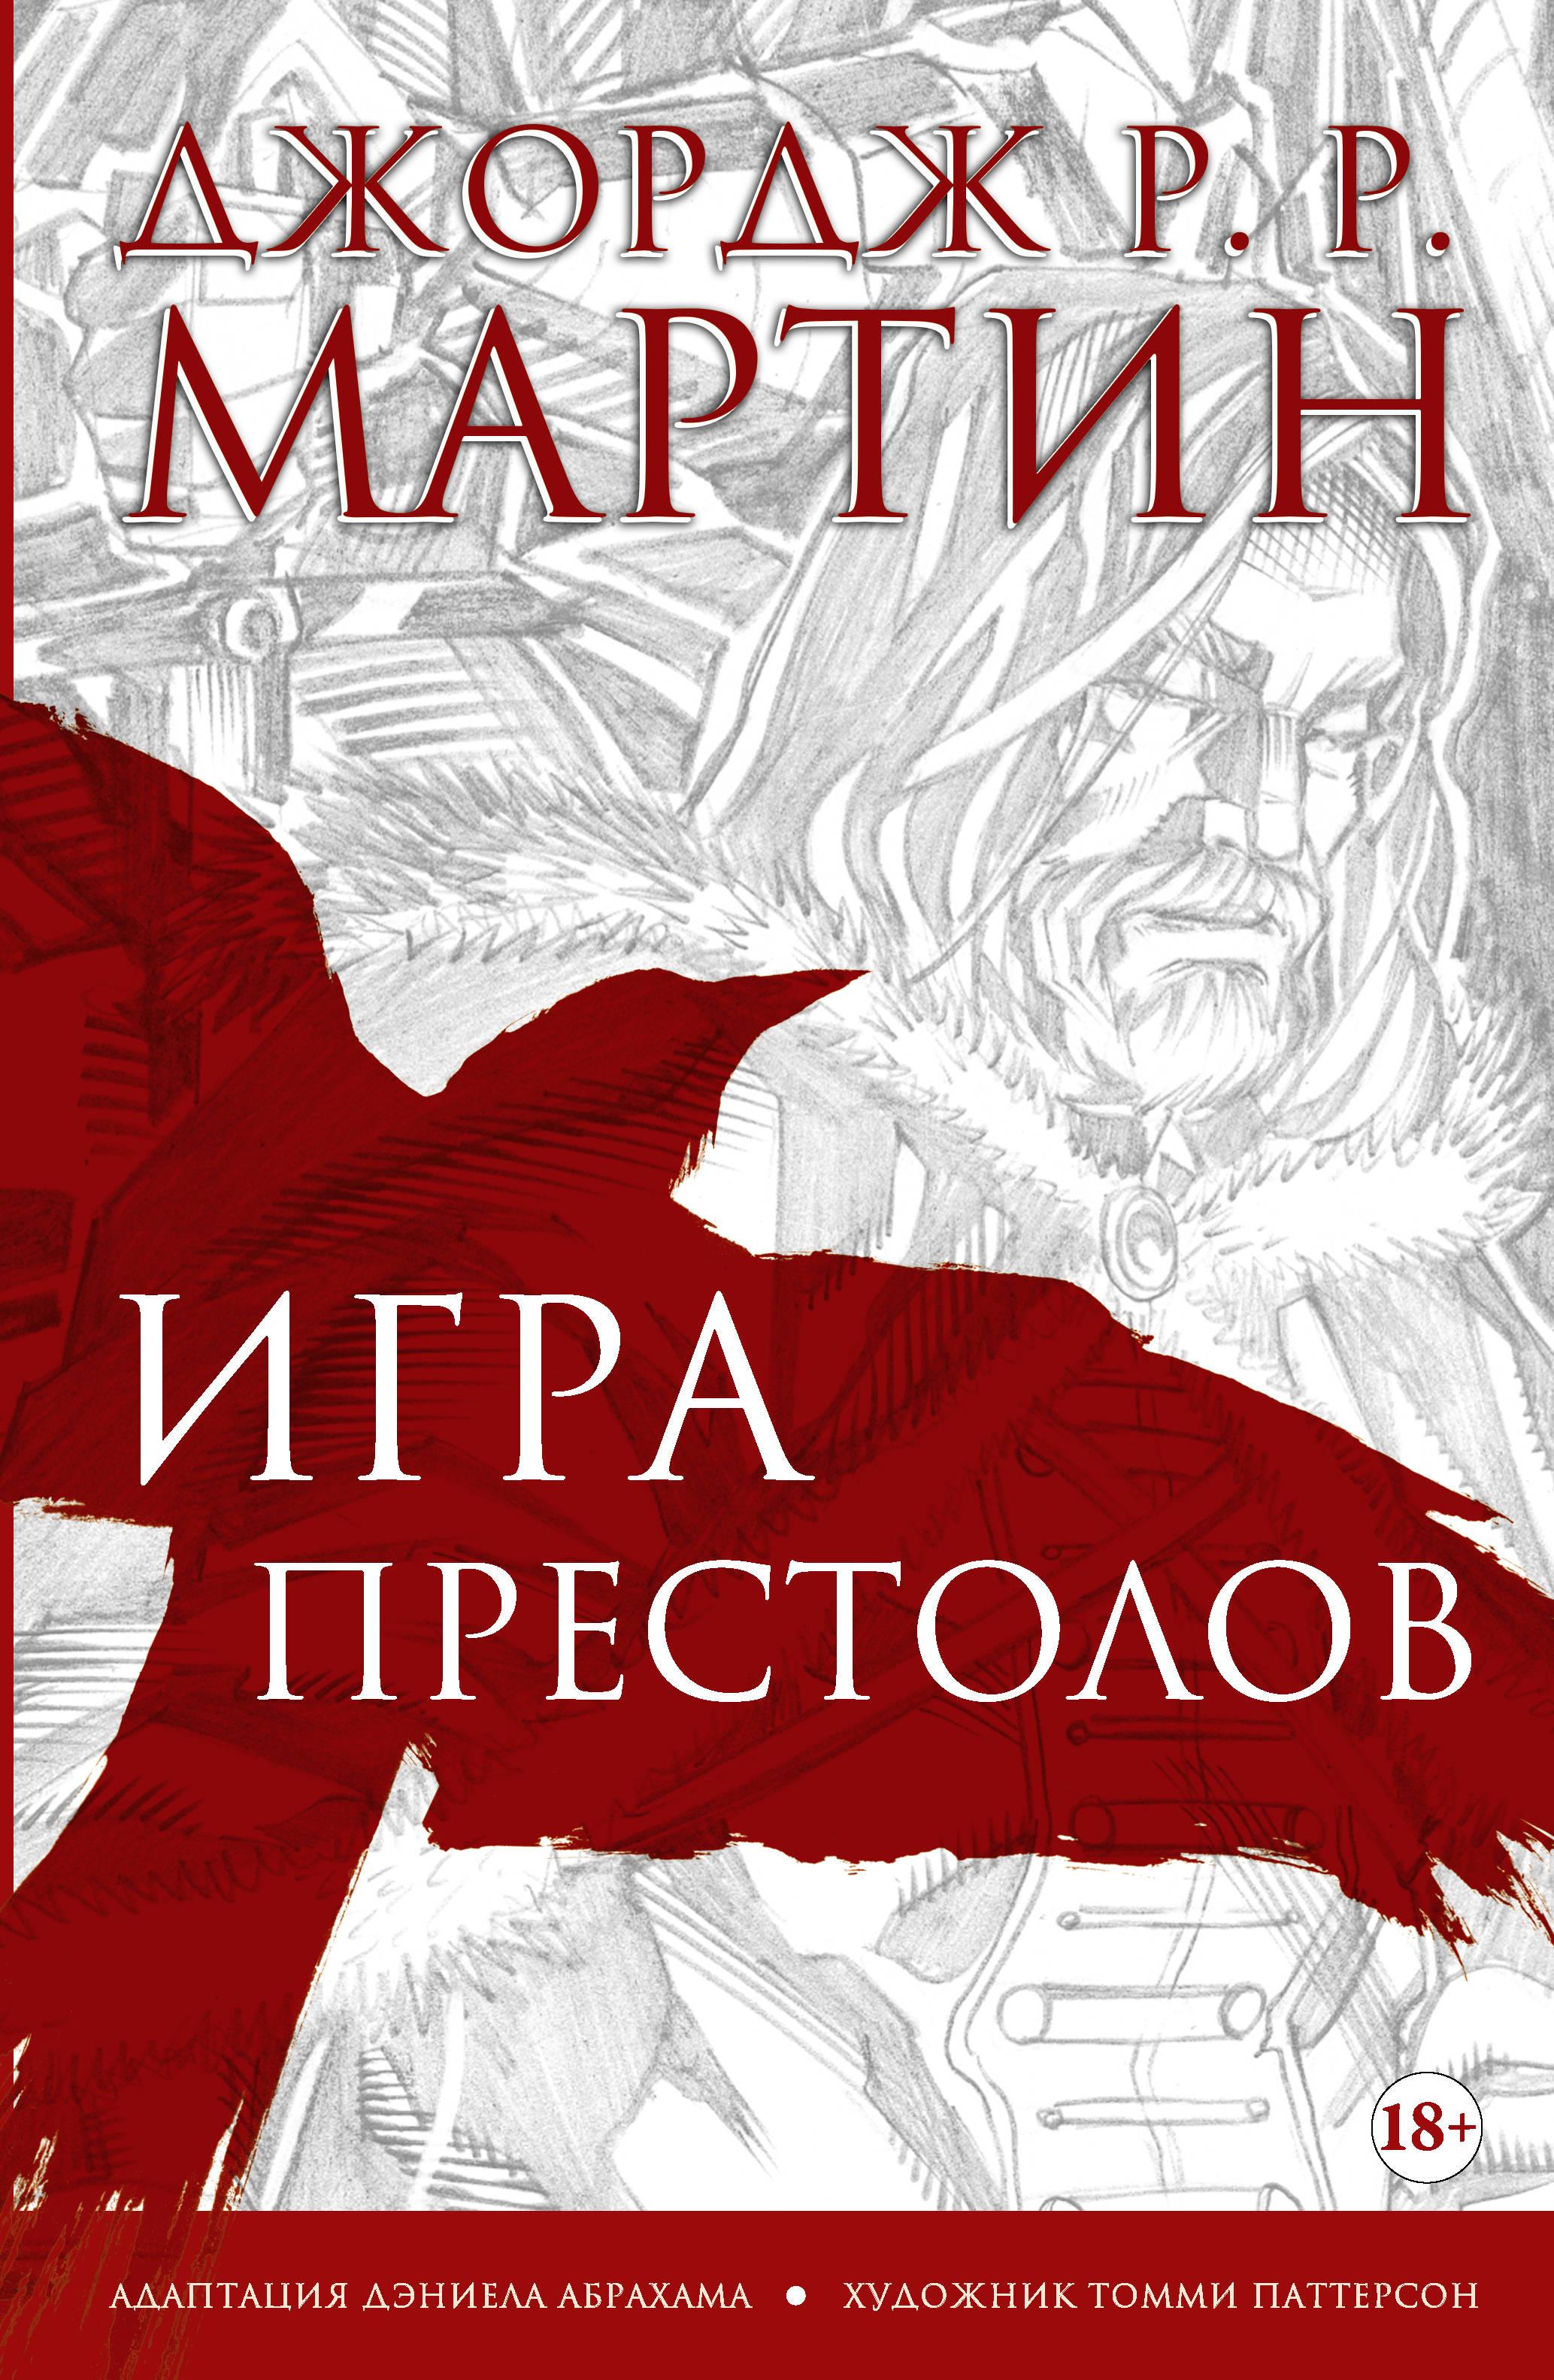 Мартин Д. Игра престолов. Графический роман ISBN: 978-5-17-110304-0